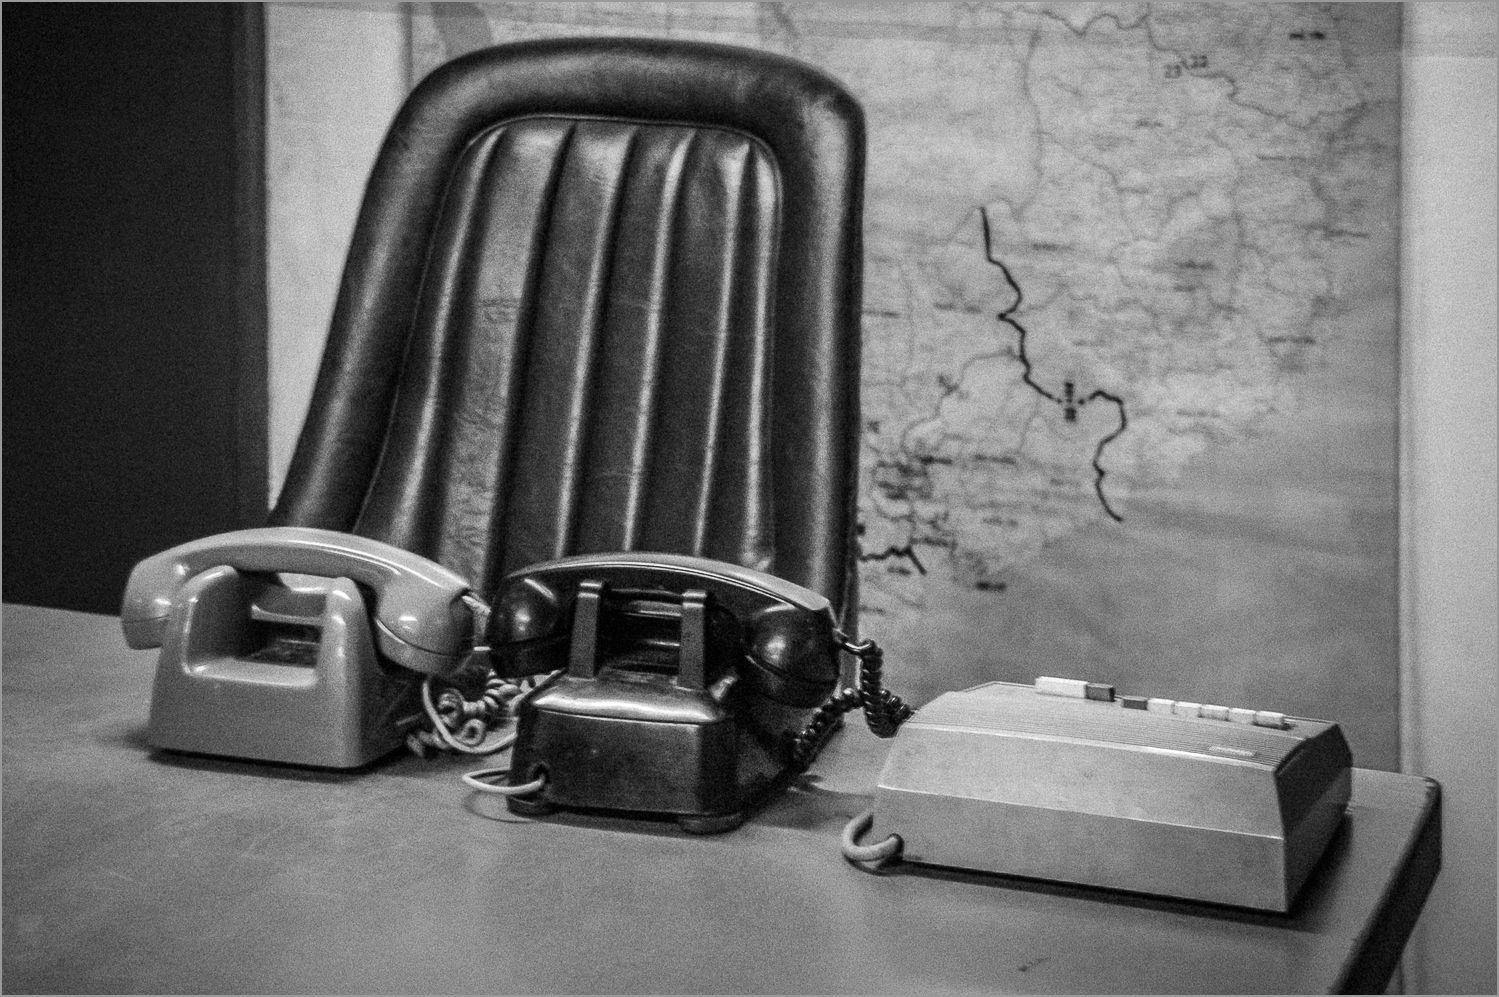 Desk at the Museum of War, Saigon, Vietnam